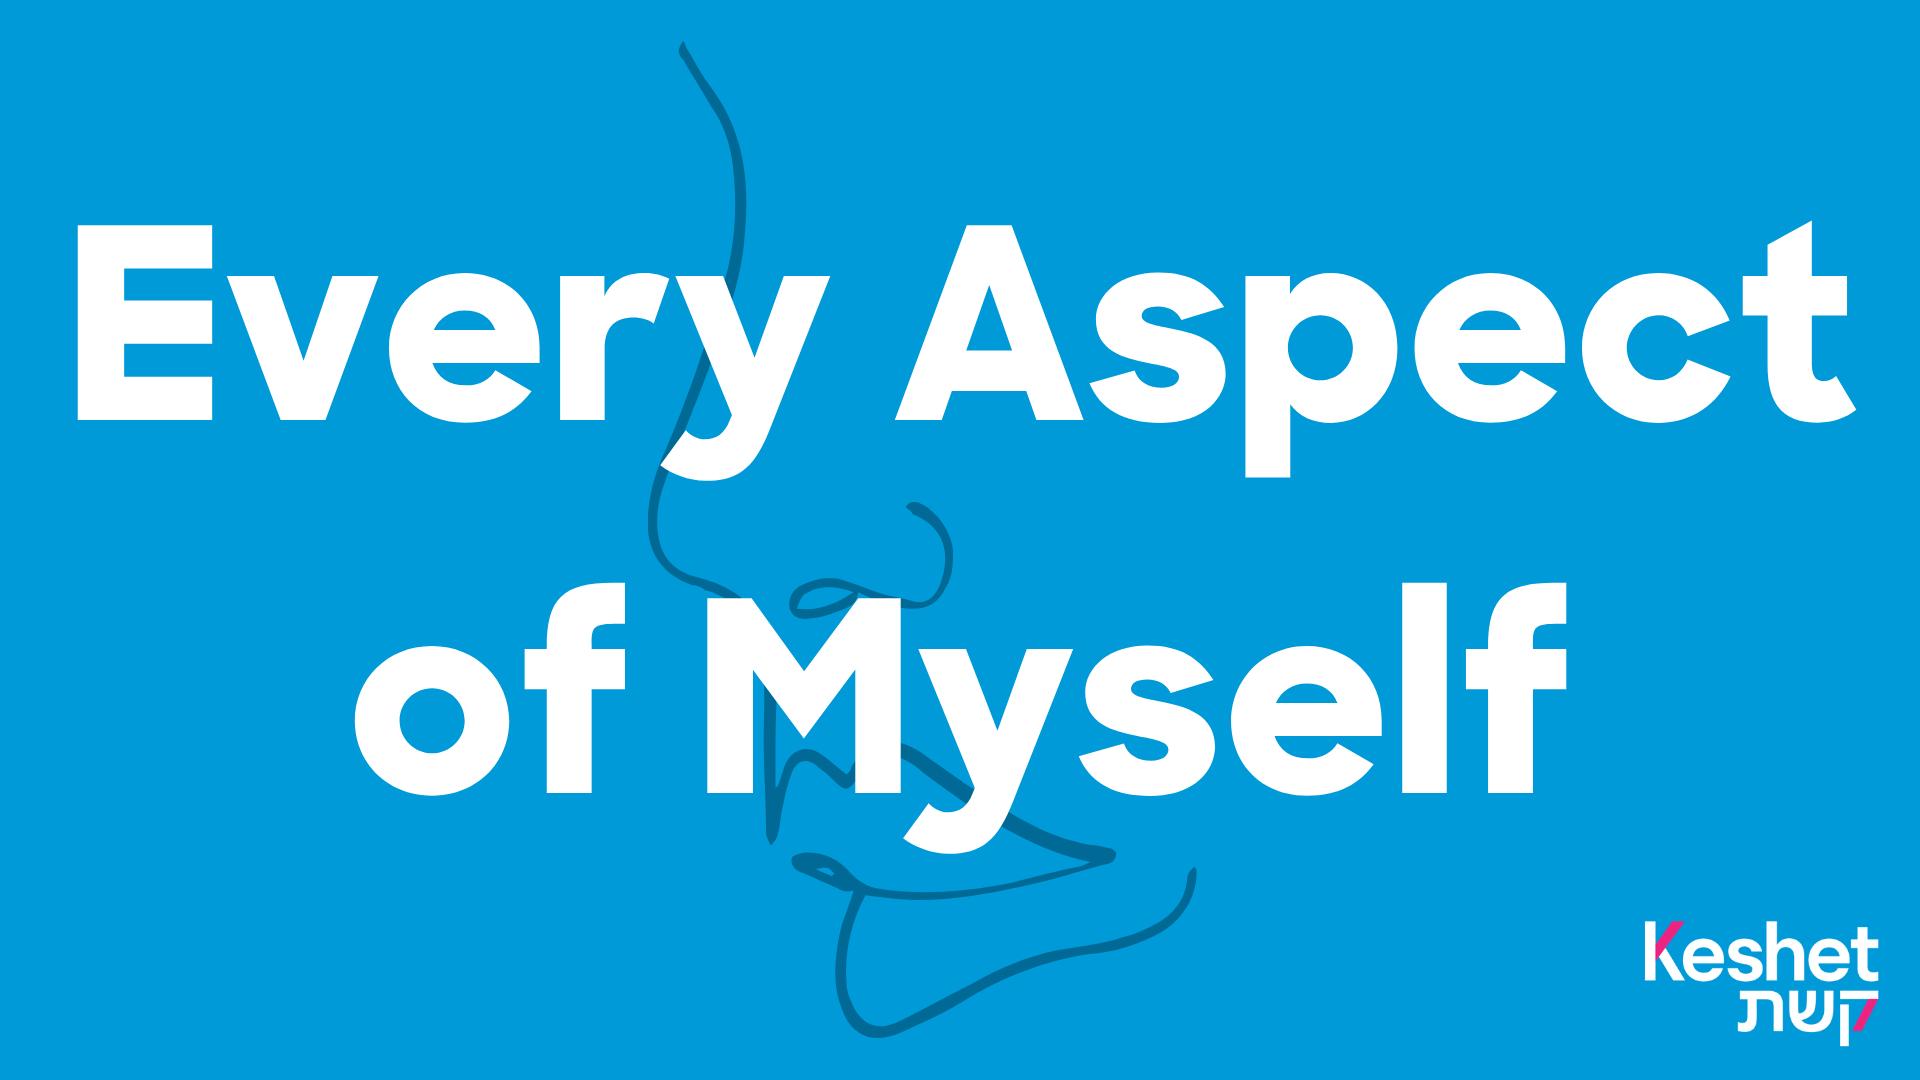 Every Aspect of Myself